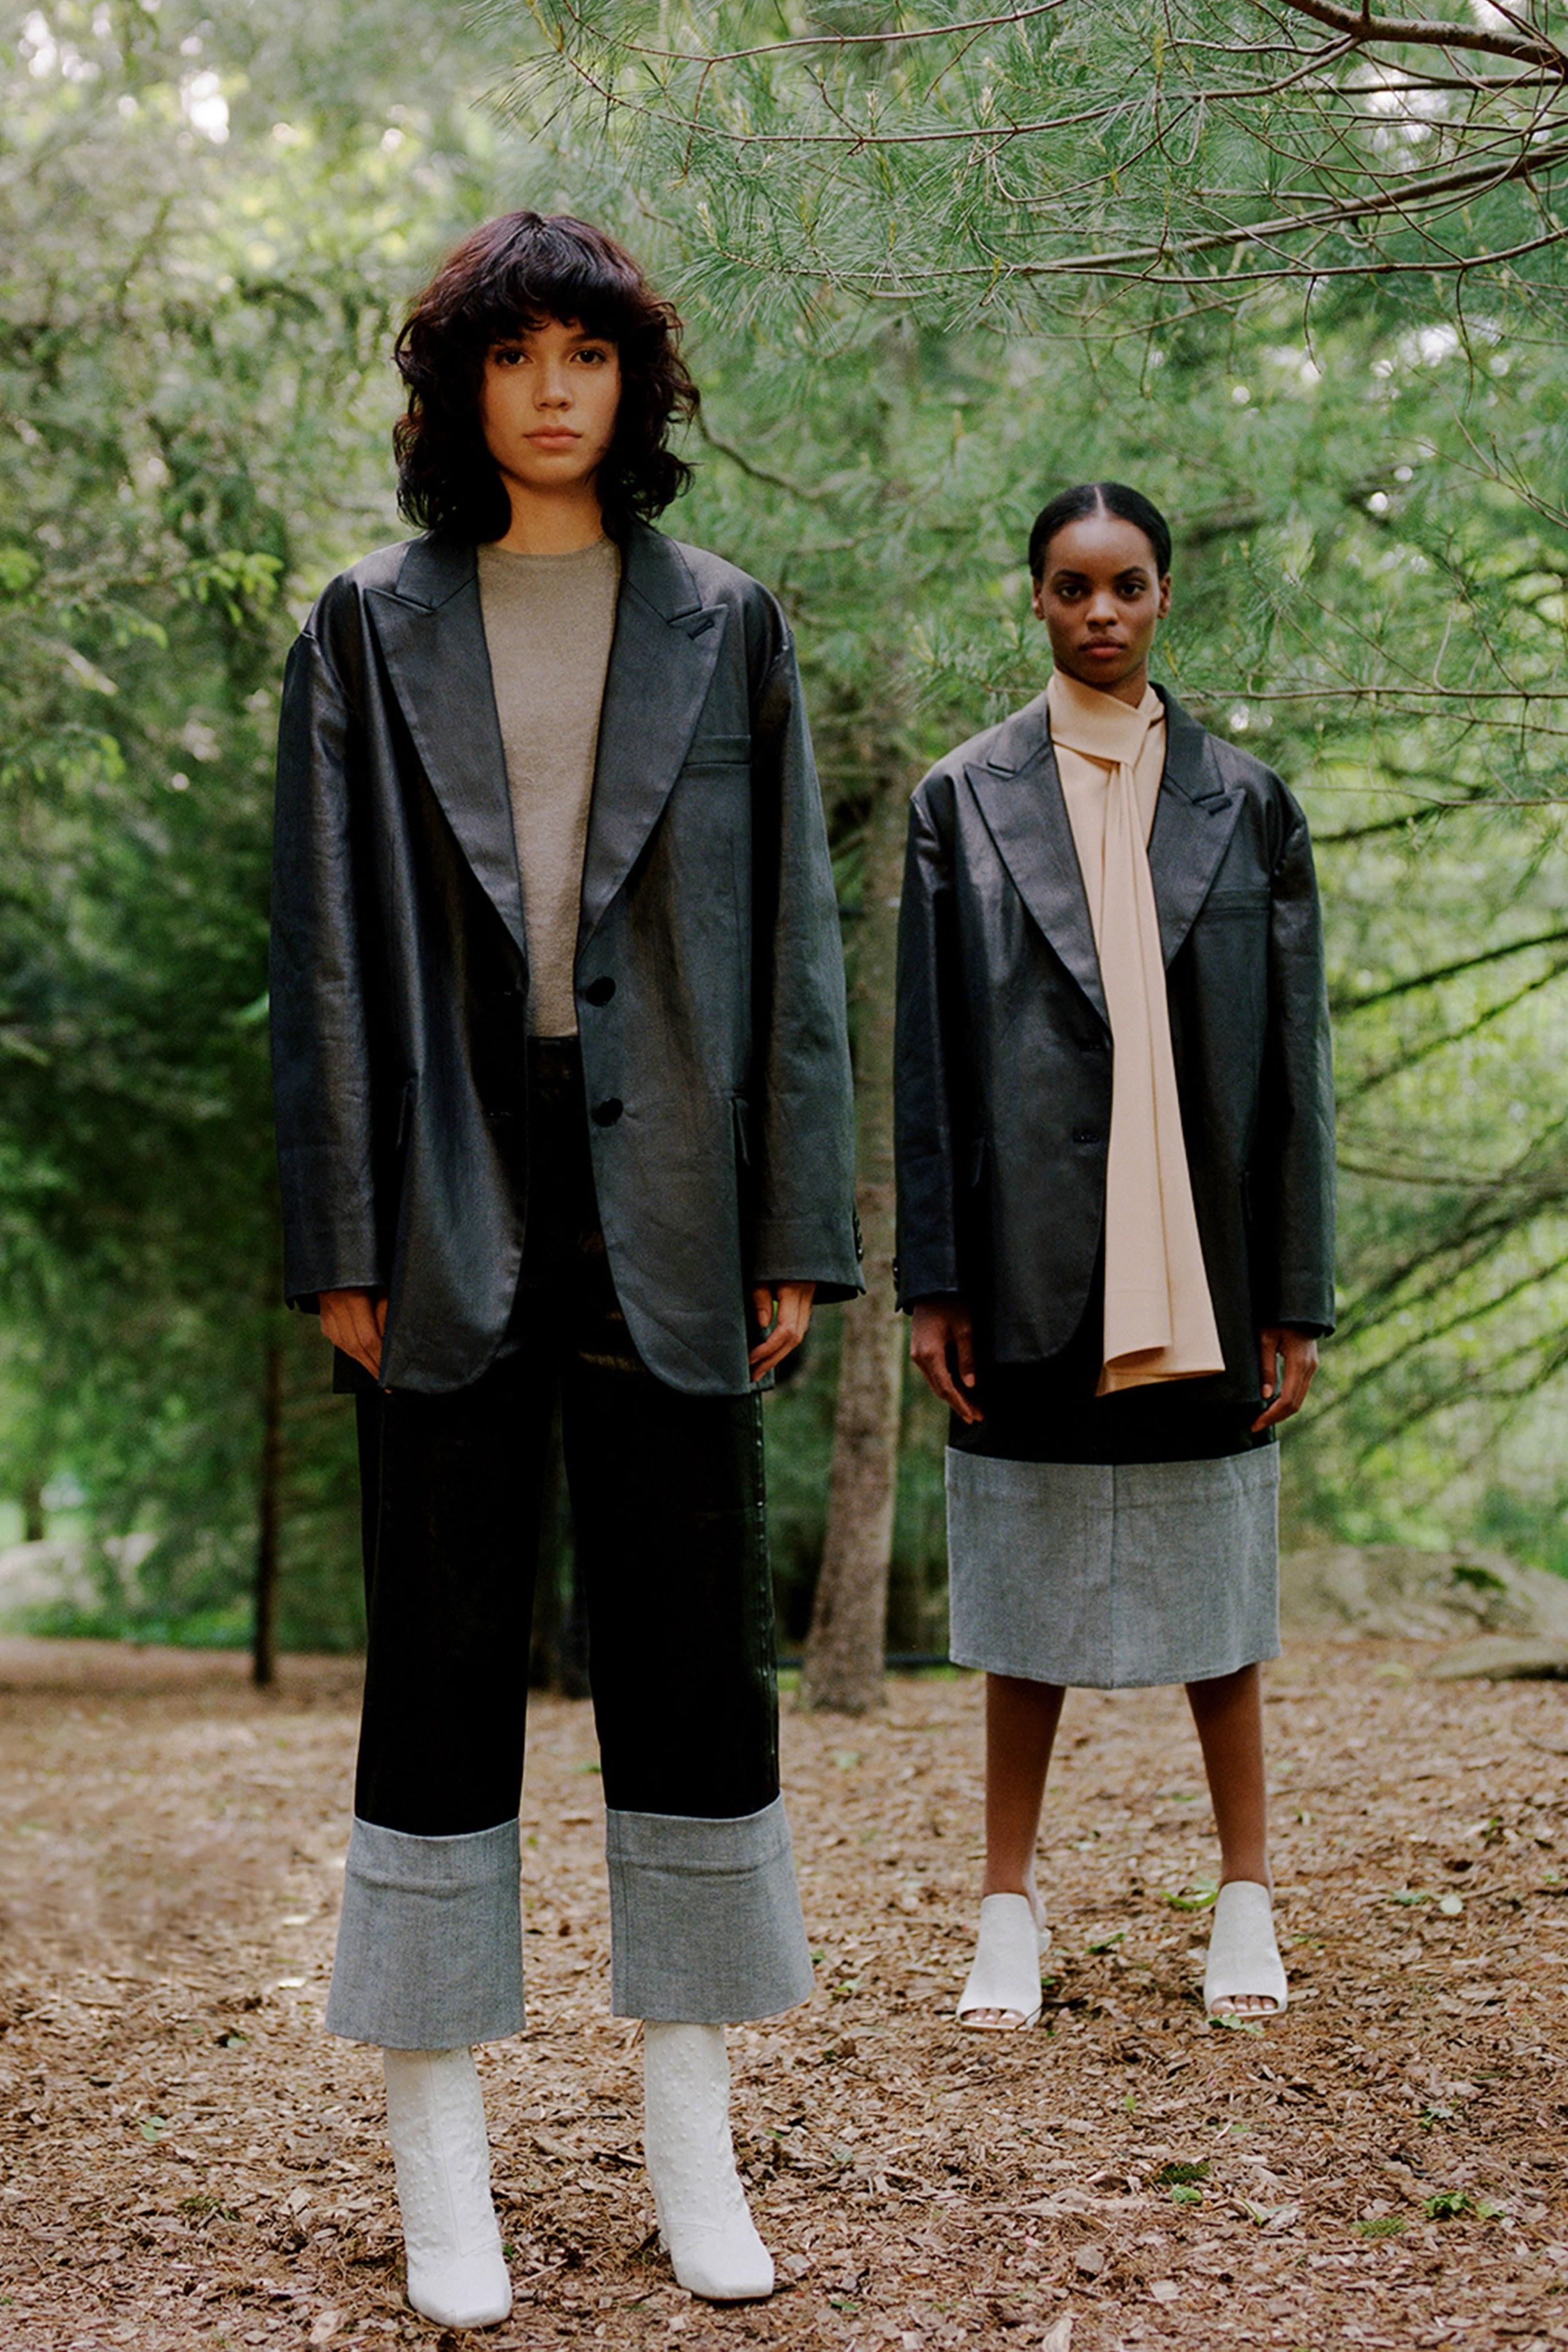 Савхин пиджак, макси юбка болон бусад дурсамж сэргээсэн 2020 оны ретро трендүүд (фото 2)